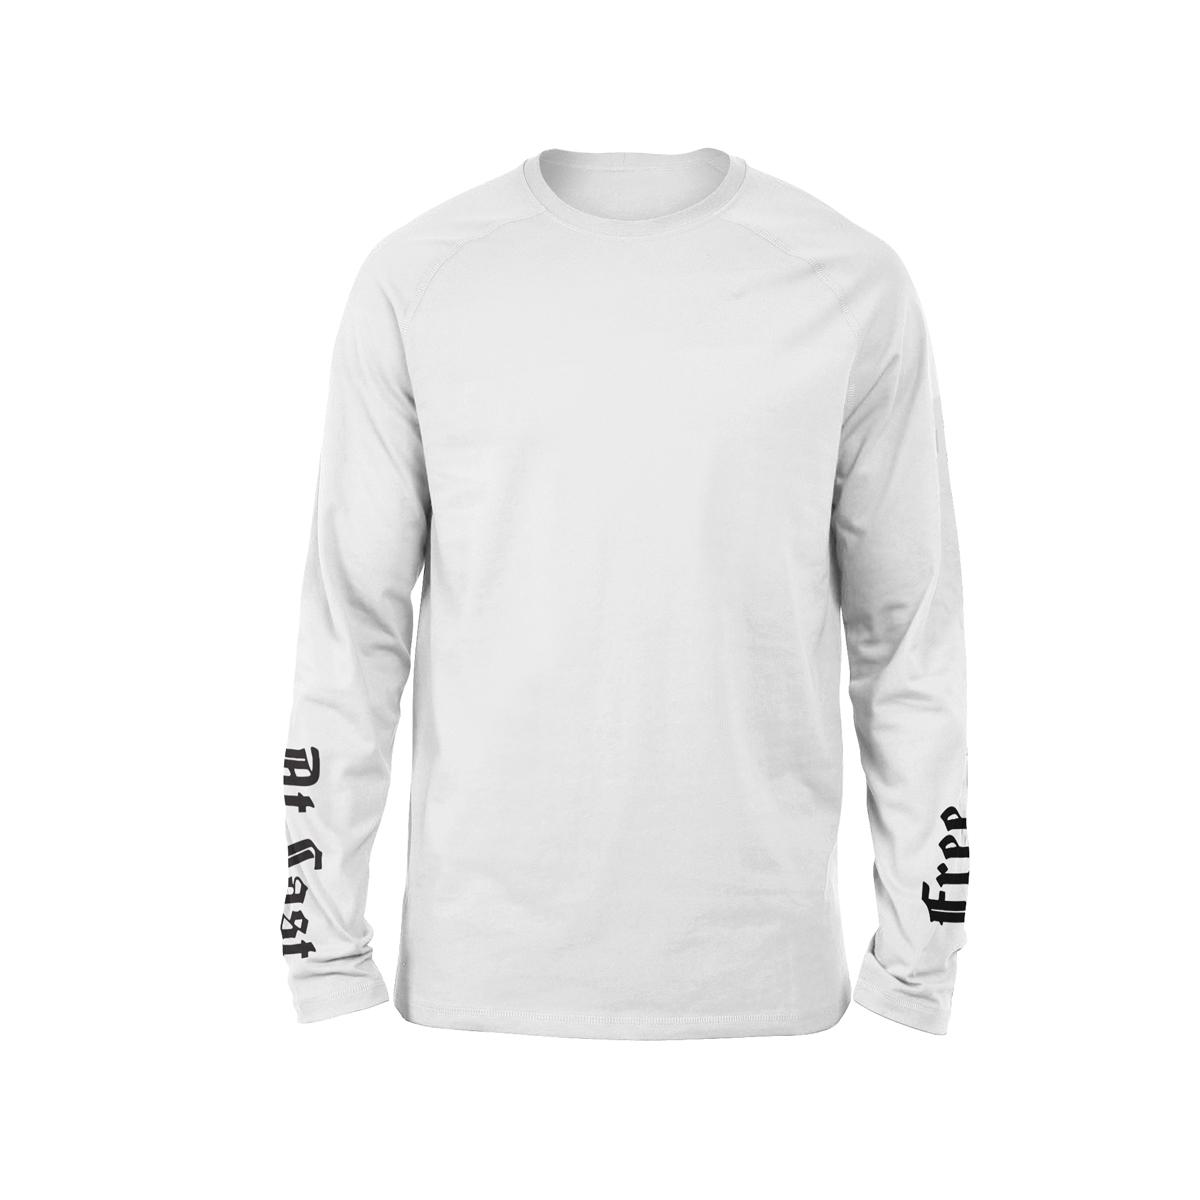 Free At Last Album + Casanova Free At Last White Long Sleeve T-shirt